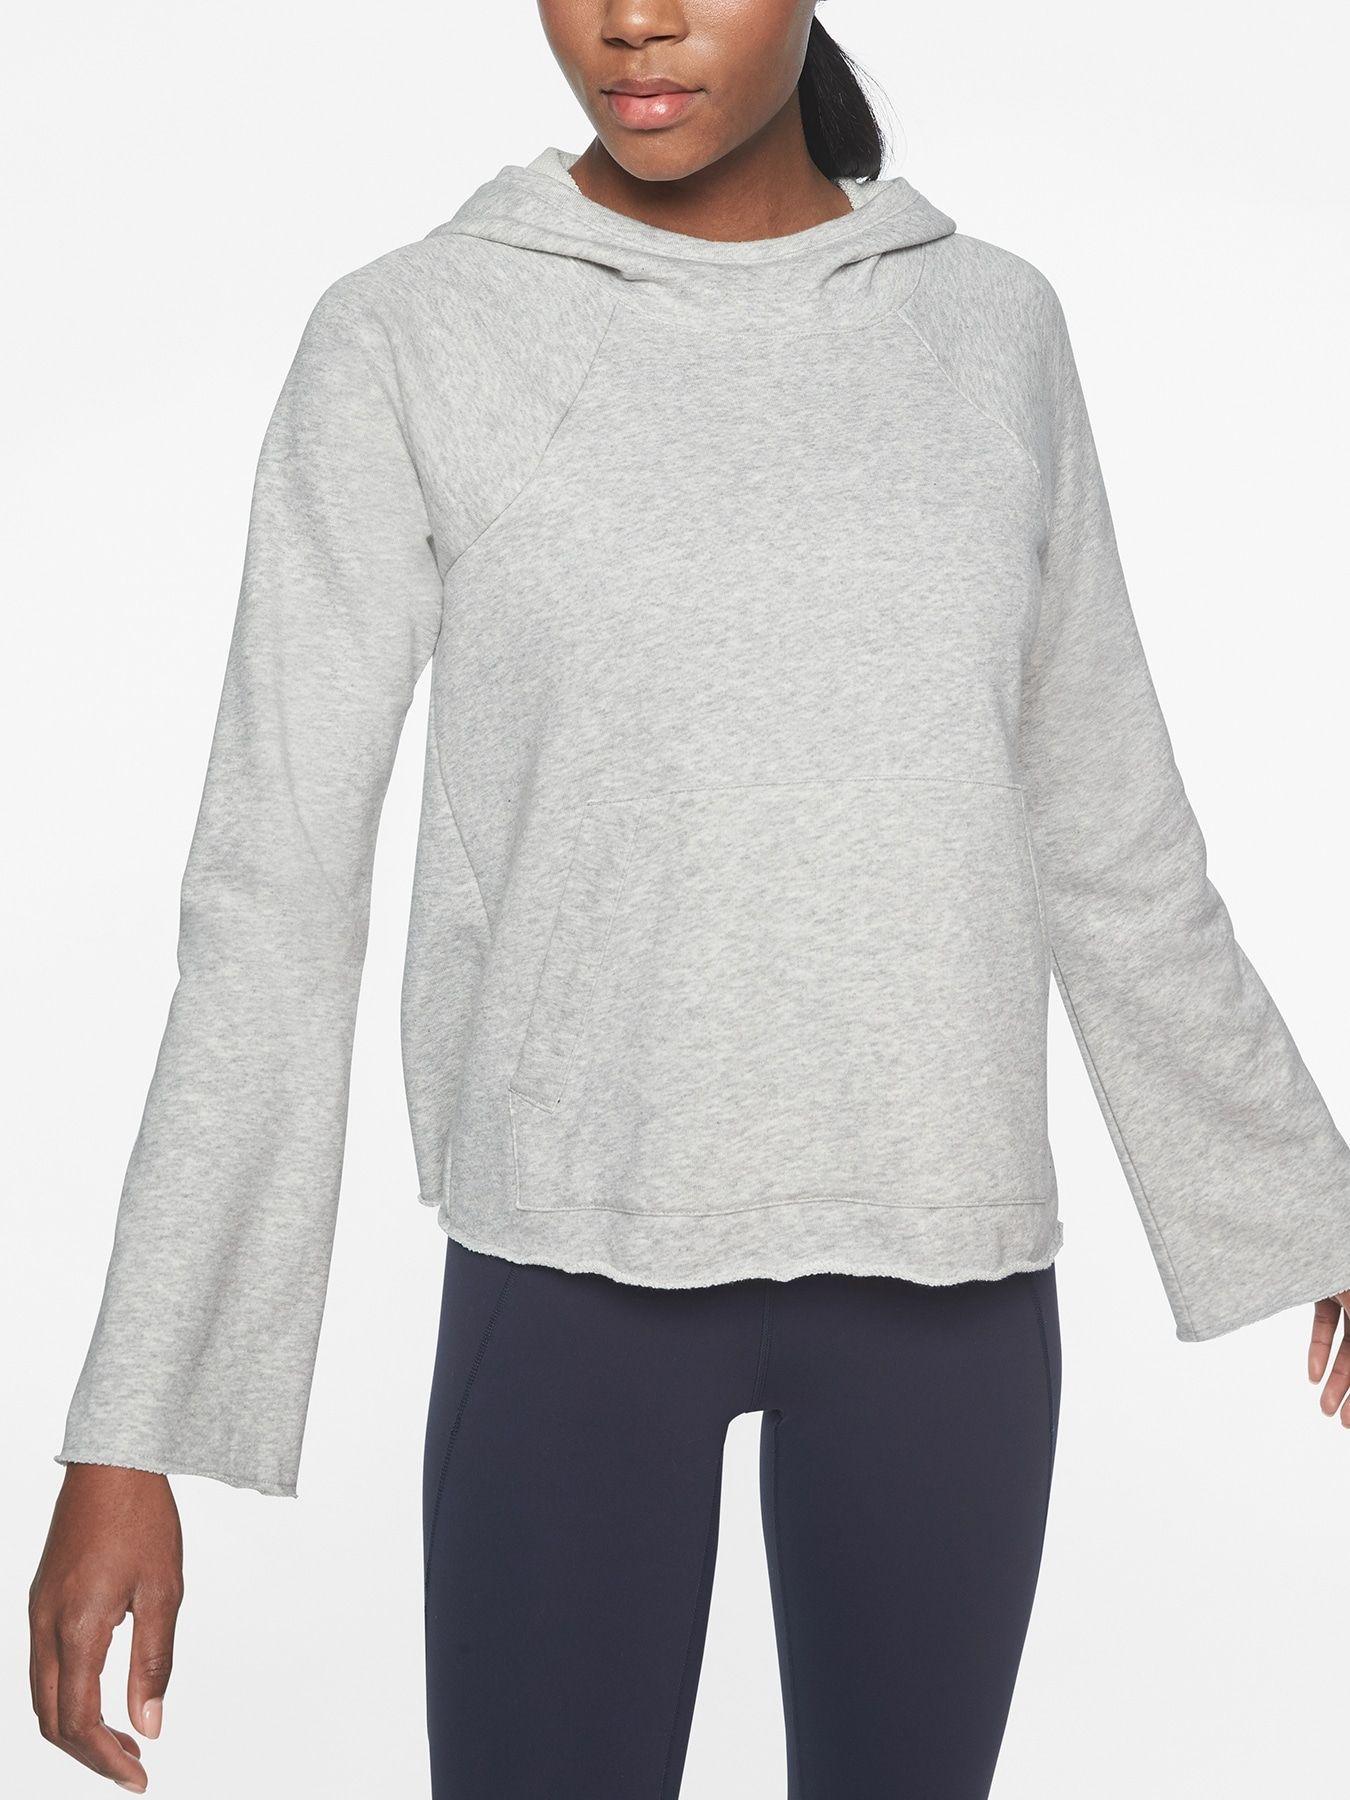 Product Photo Athleta Fashion Womens Activewear [ 1800 x 1350 Pixel ]